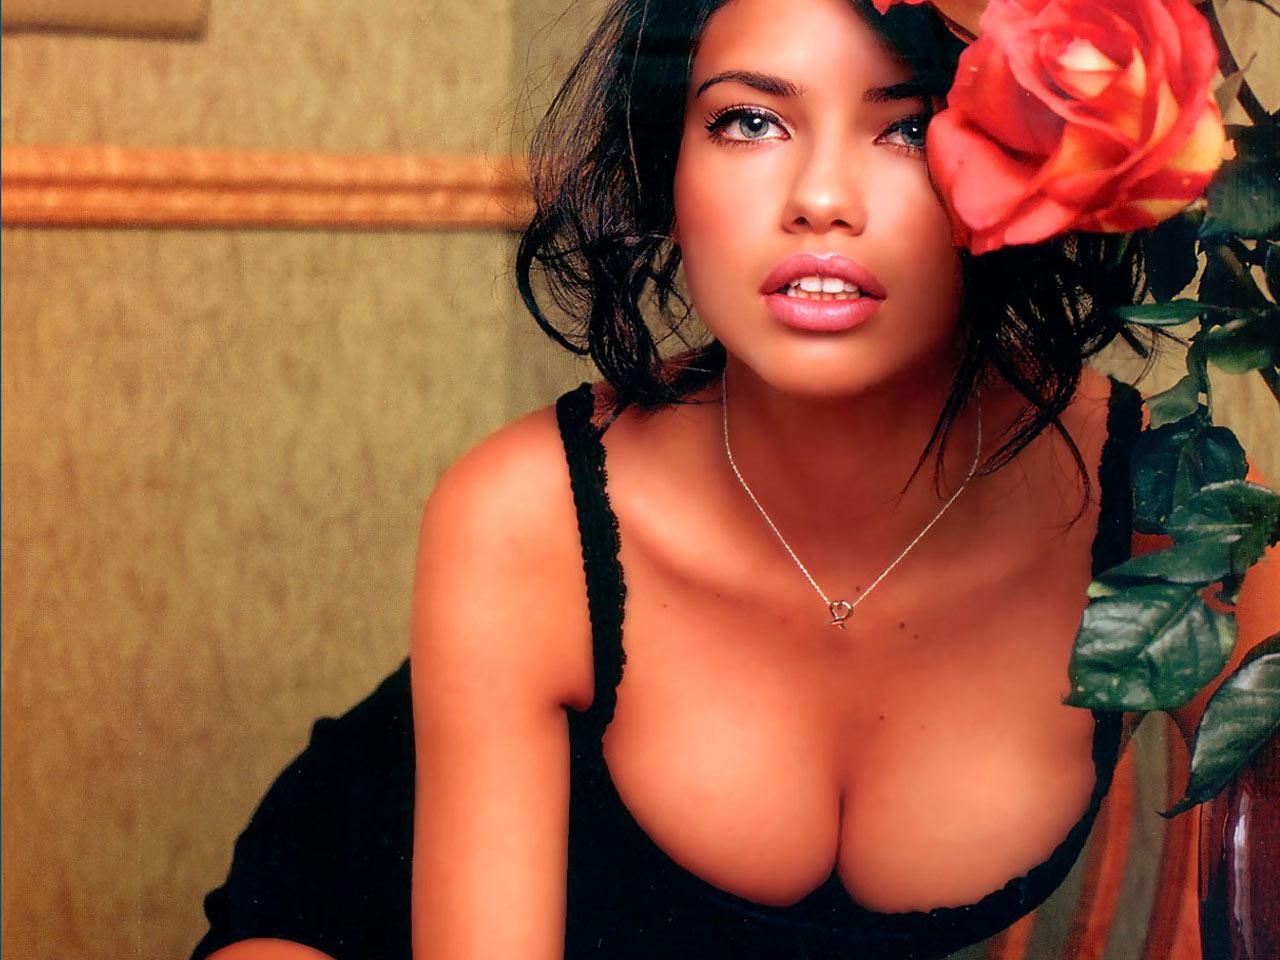 http://4.bp.blogspot.com/-2Y_wFhCxnT8/UK3JPcWv7WI/AAAAAAAABe8/Fj1QJRaCQr8/s1600/Adriana+Lima+Hot+2012+_.jpg